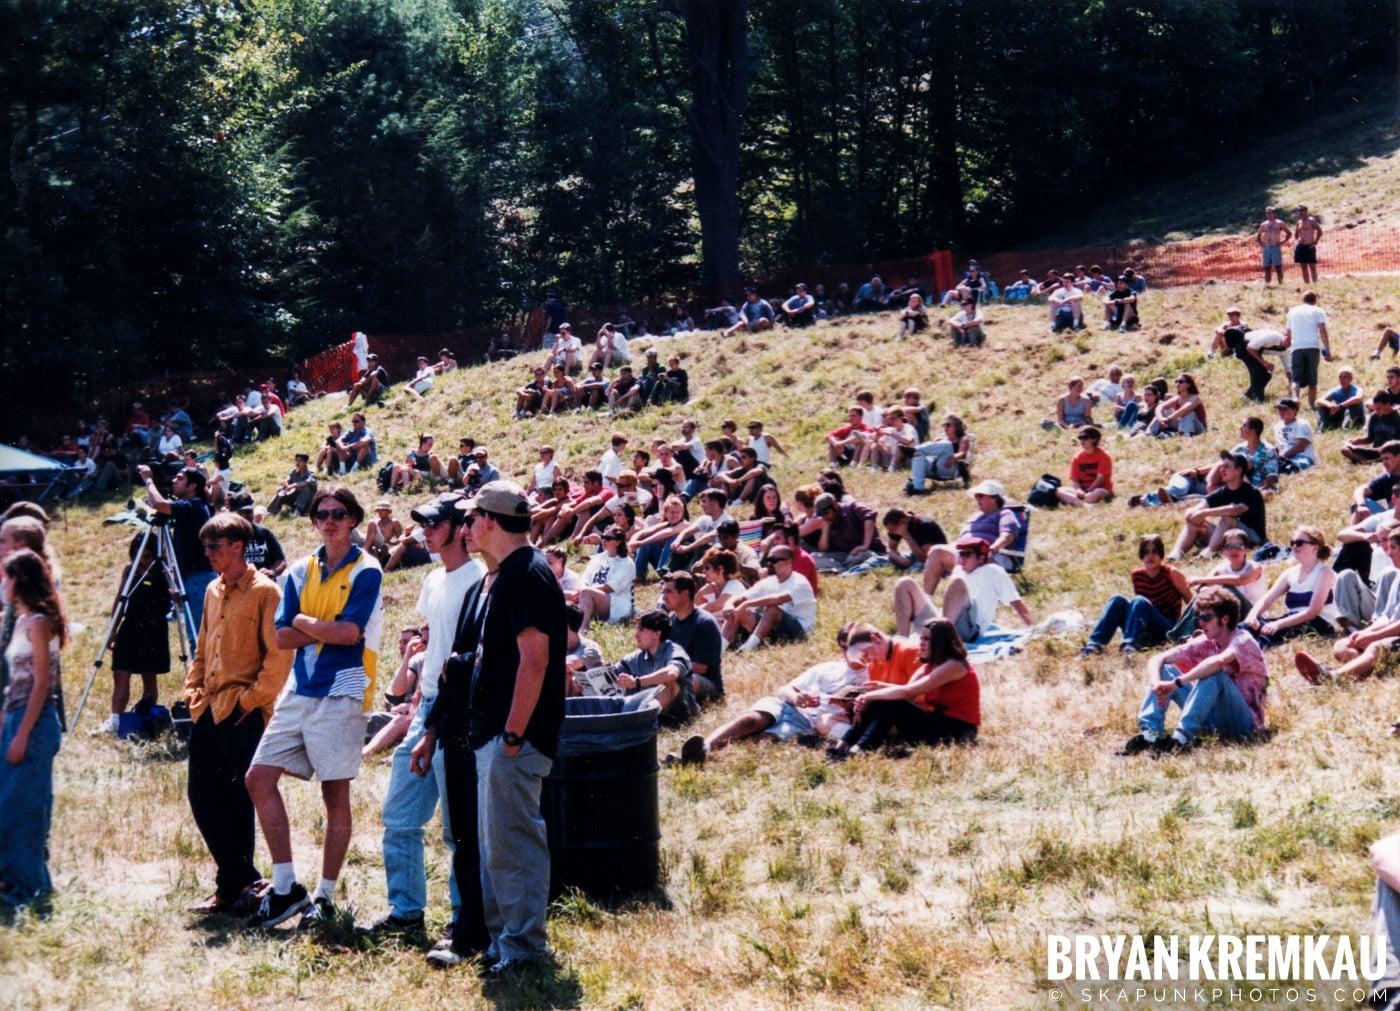 Crowd Shots @ New England Ska Fest 98, Westford, MA - 8.22.98 (10)